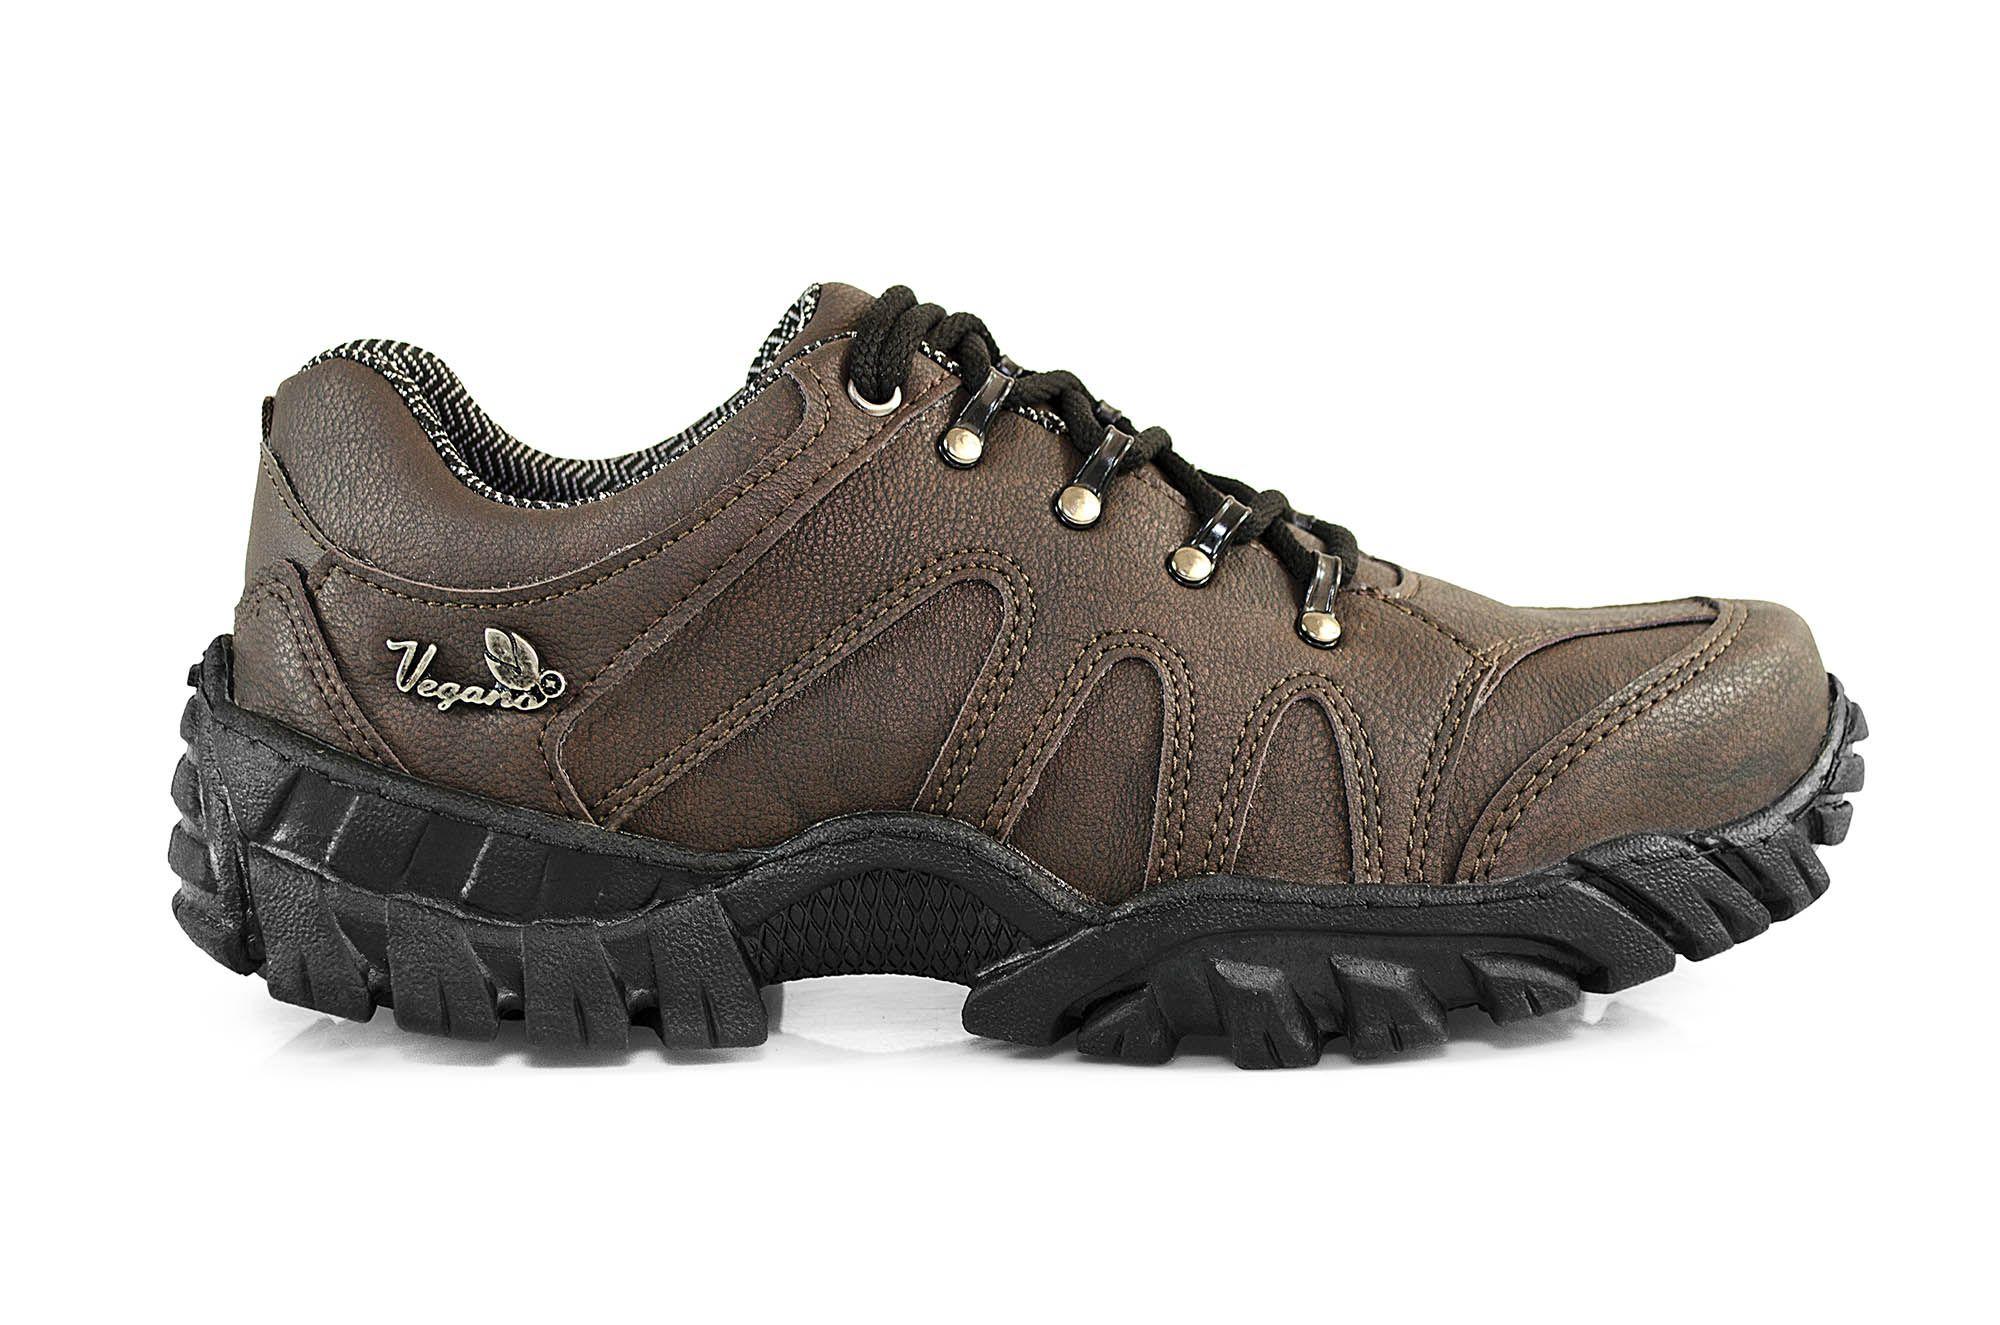 Tênis Vegano Shoes Imbuia Bistre